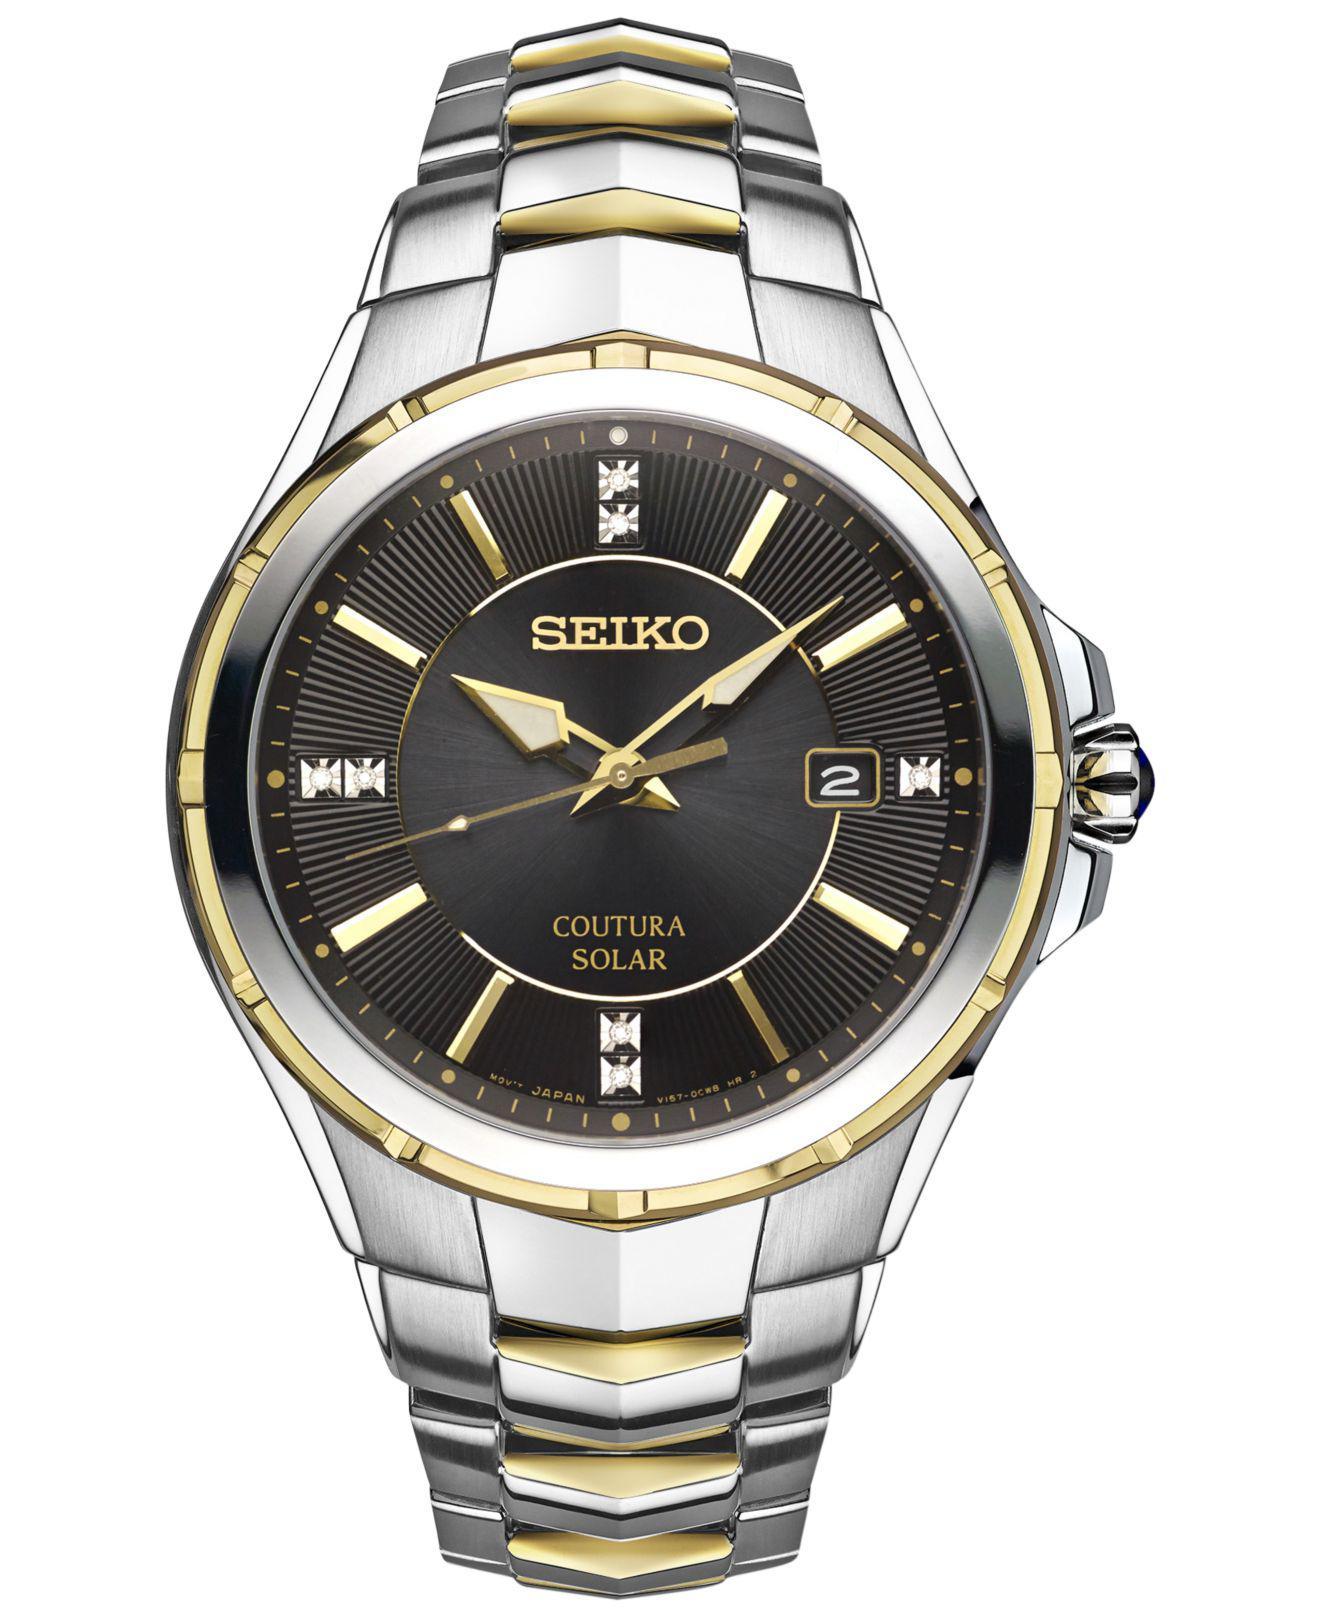 1603bccf5c4 Lyst - Seiko Men s Solar Coutura Diamond Accent Two-tone Stainless ...